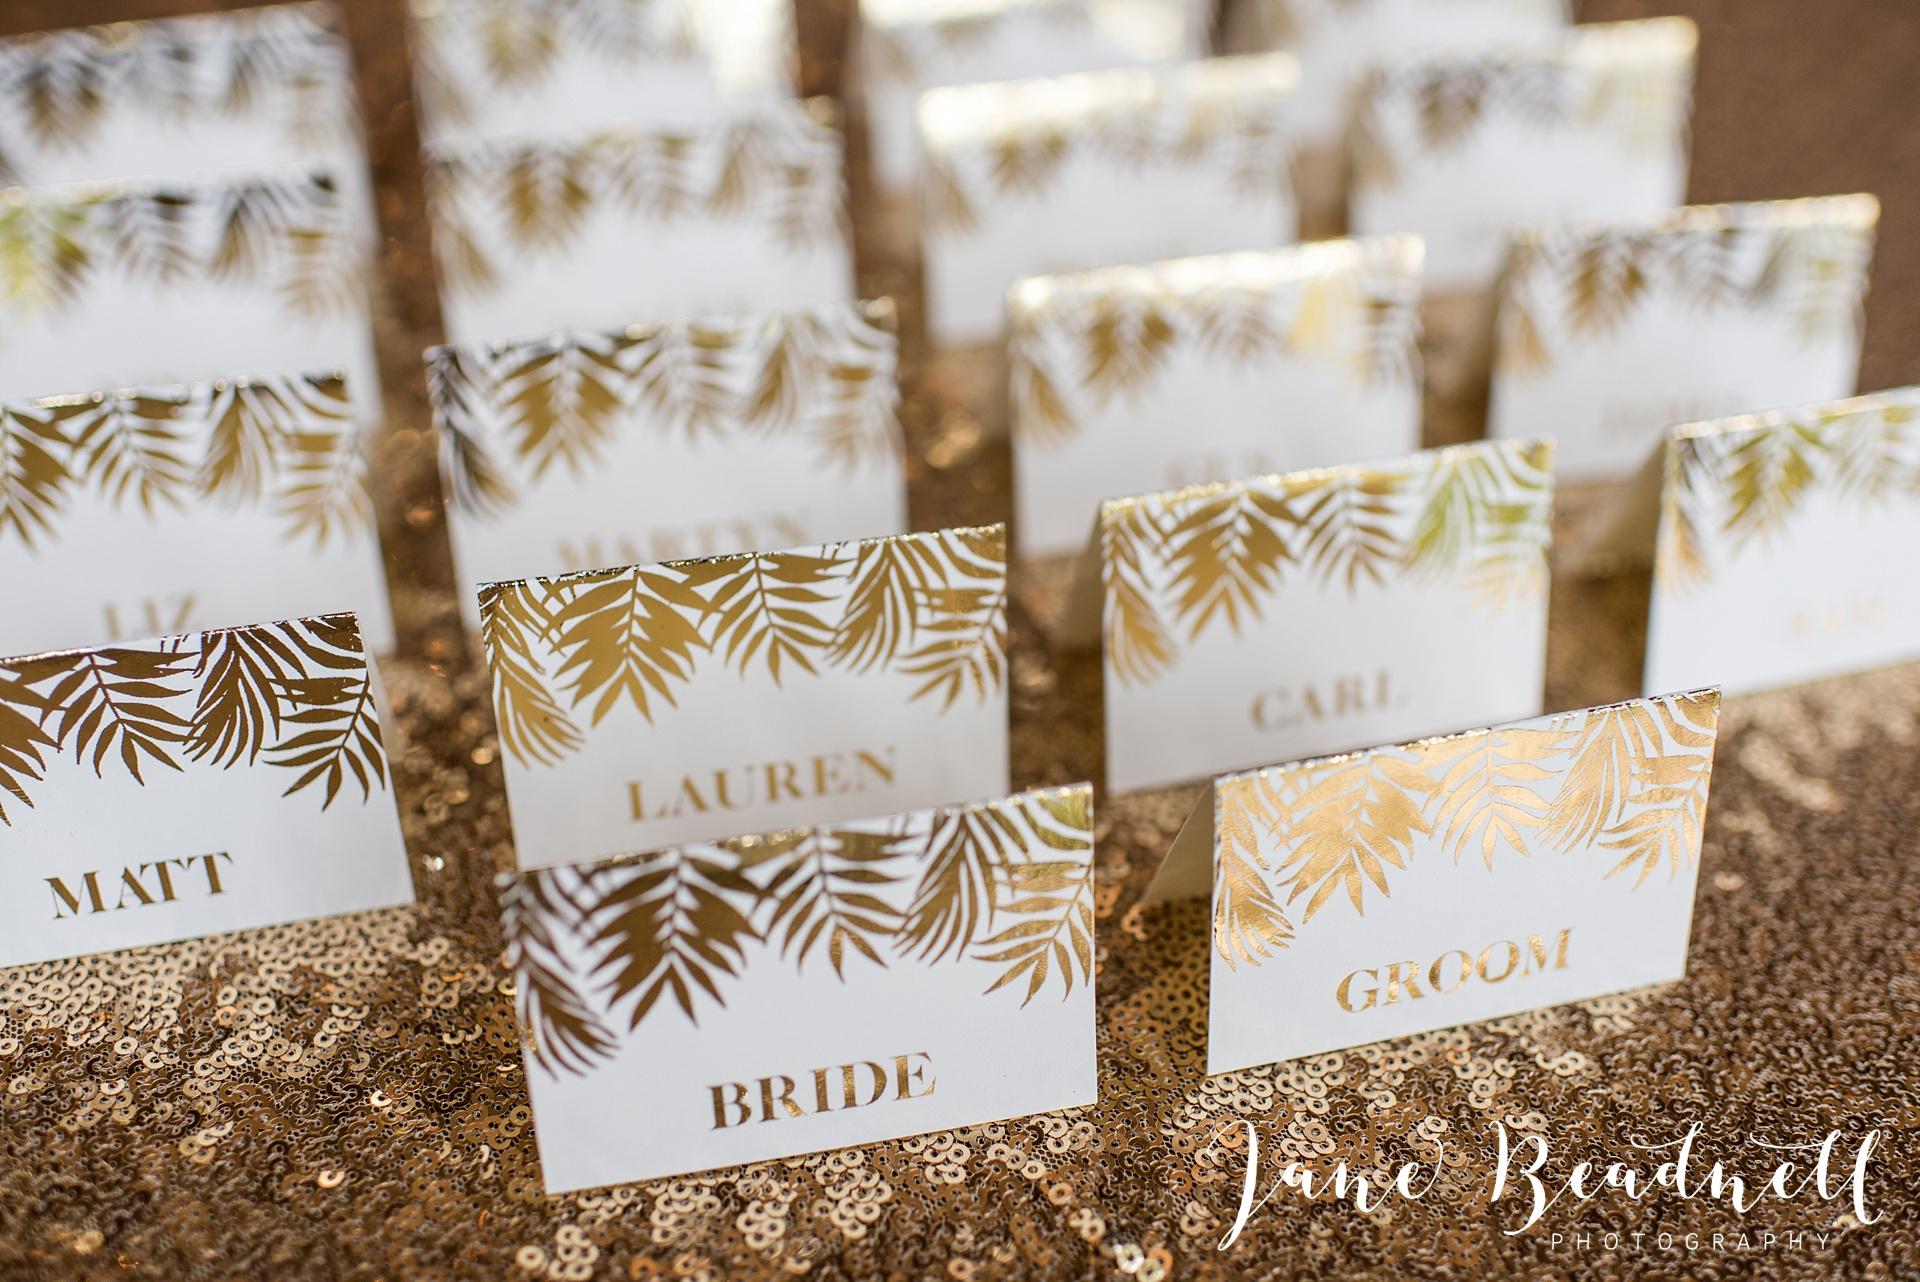 The-Orangery-Gold-Glam-photoshoot-by-Jane-Beadnell-Photography-York_0070.jpg